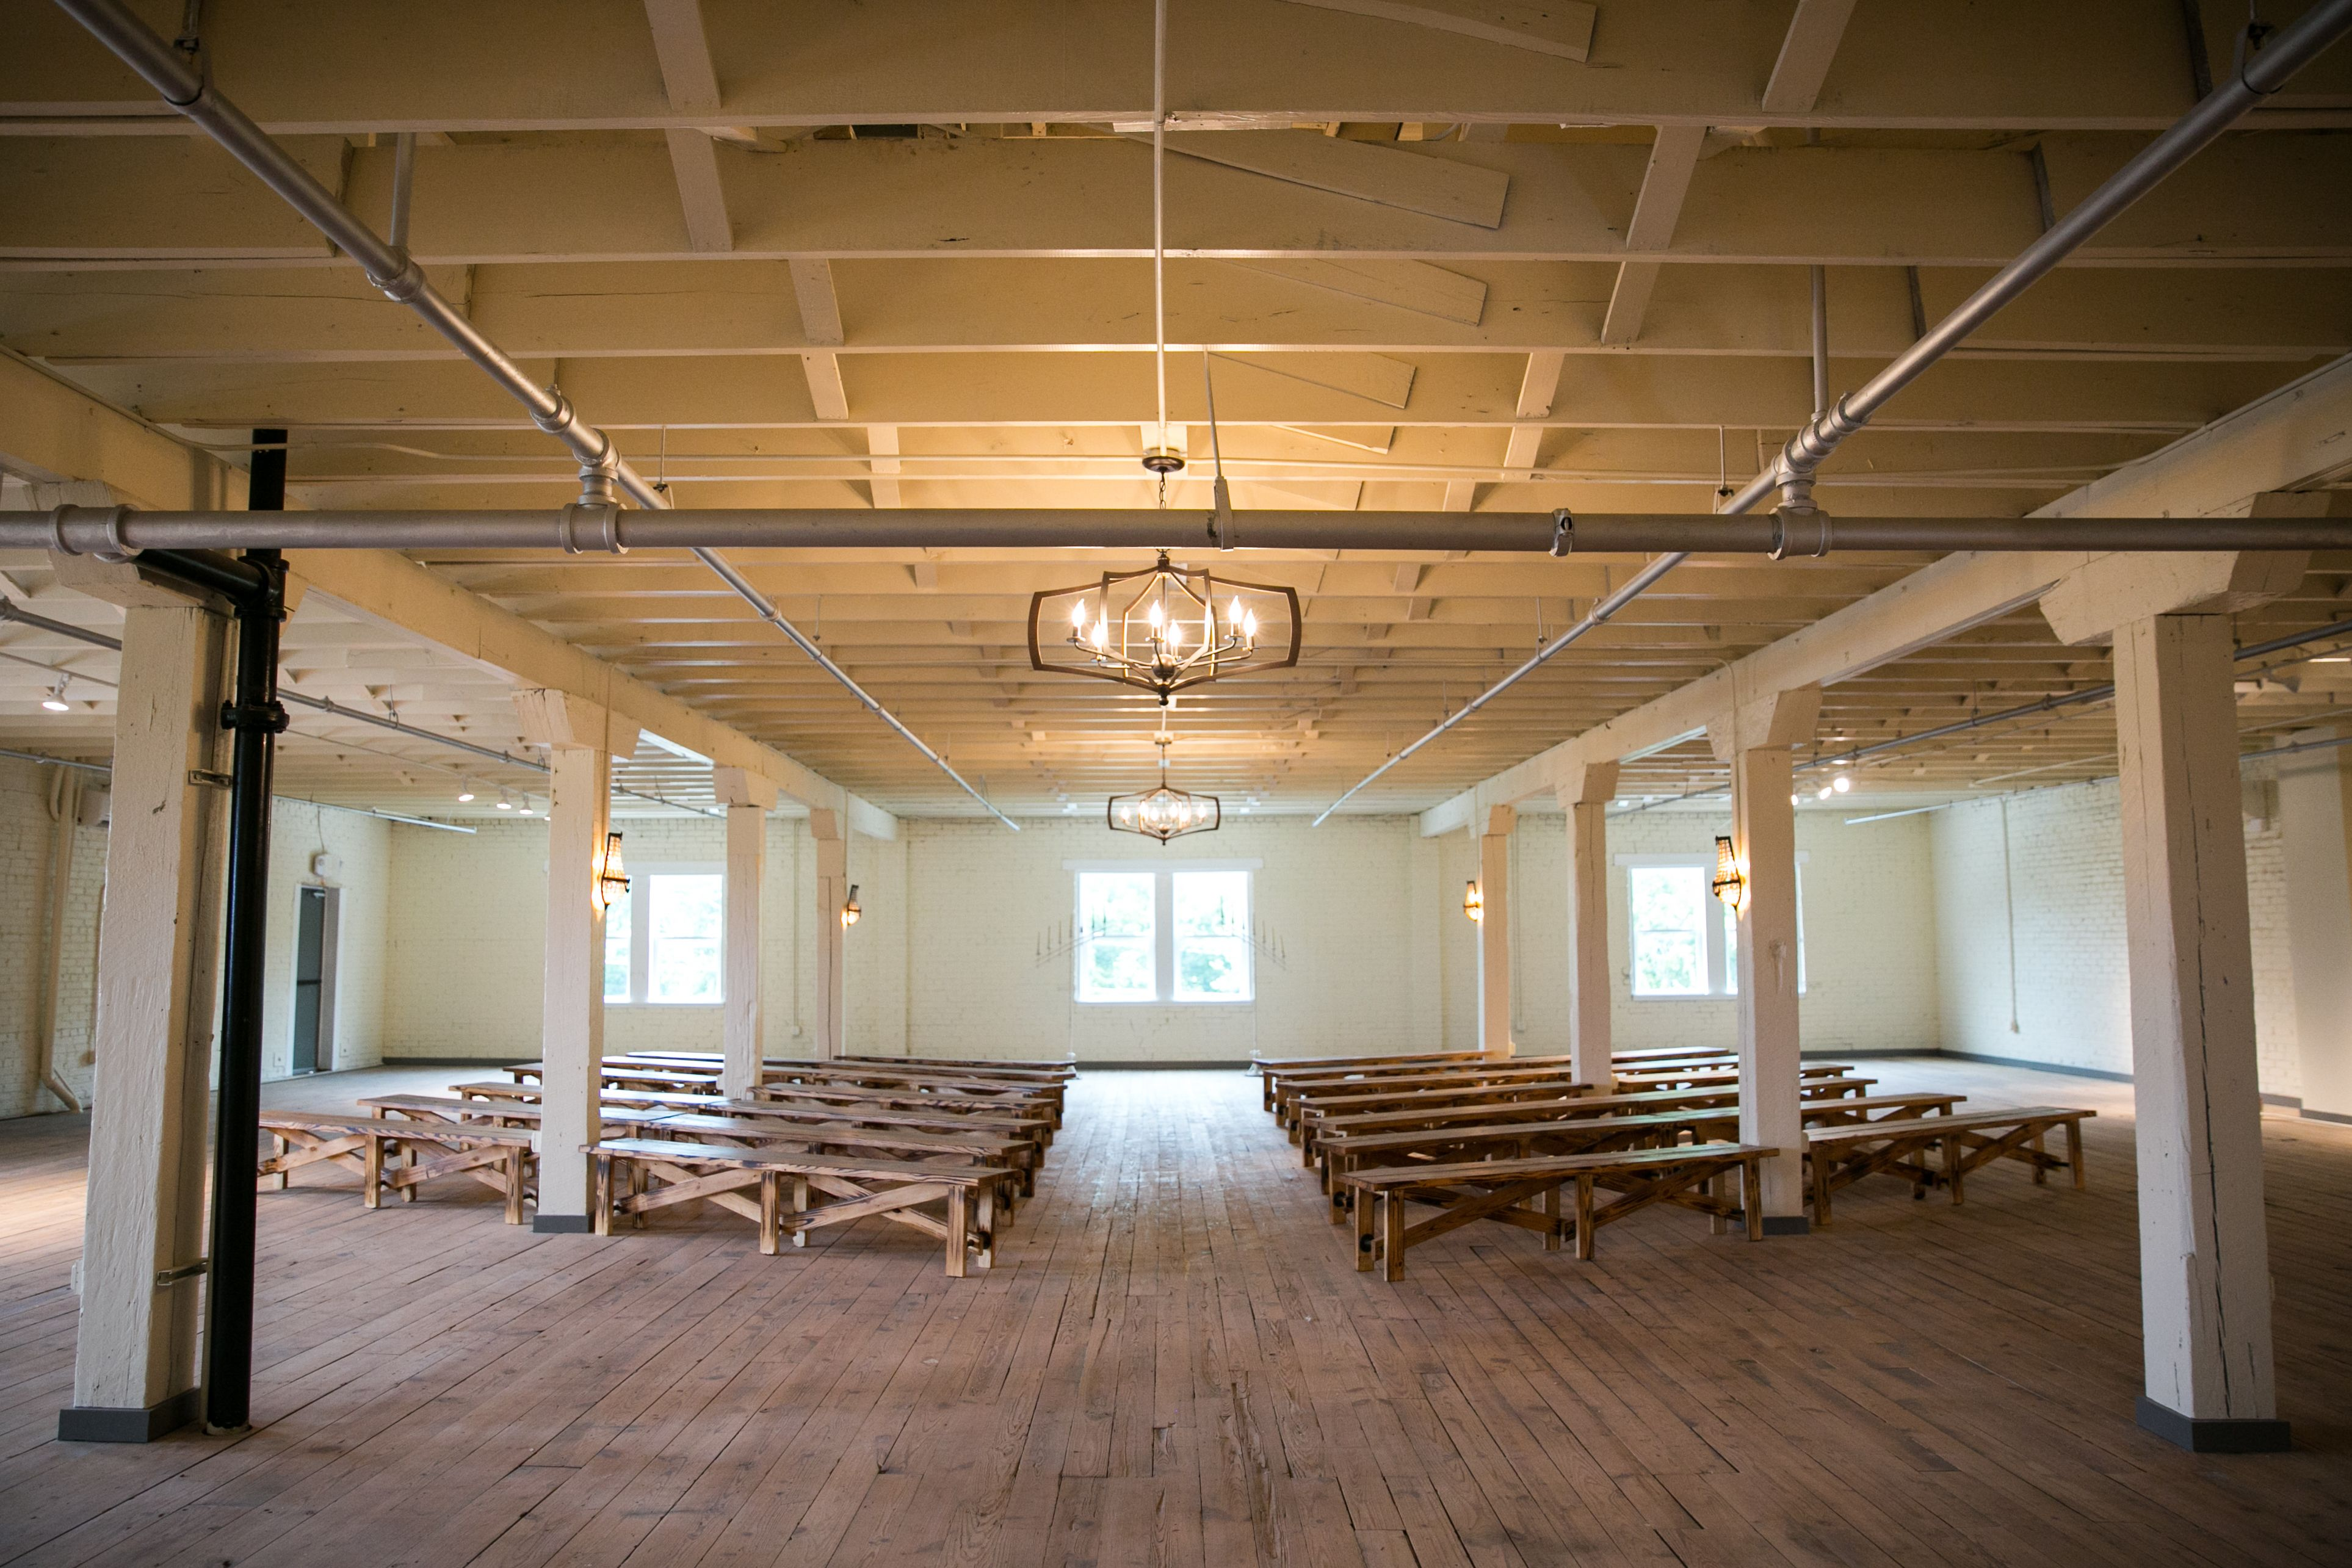 outdoor wedding venues in fort worth tx%0A BRIK Venue   Weddings   Events   Fort Worth   Texas Weddings   Ceremony    Chandelier